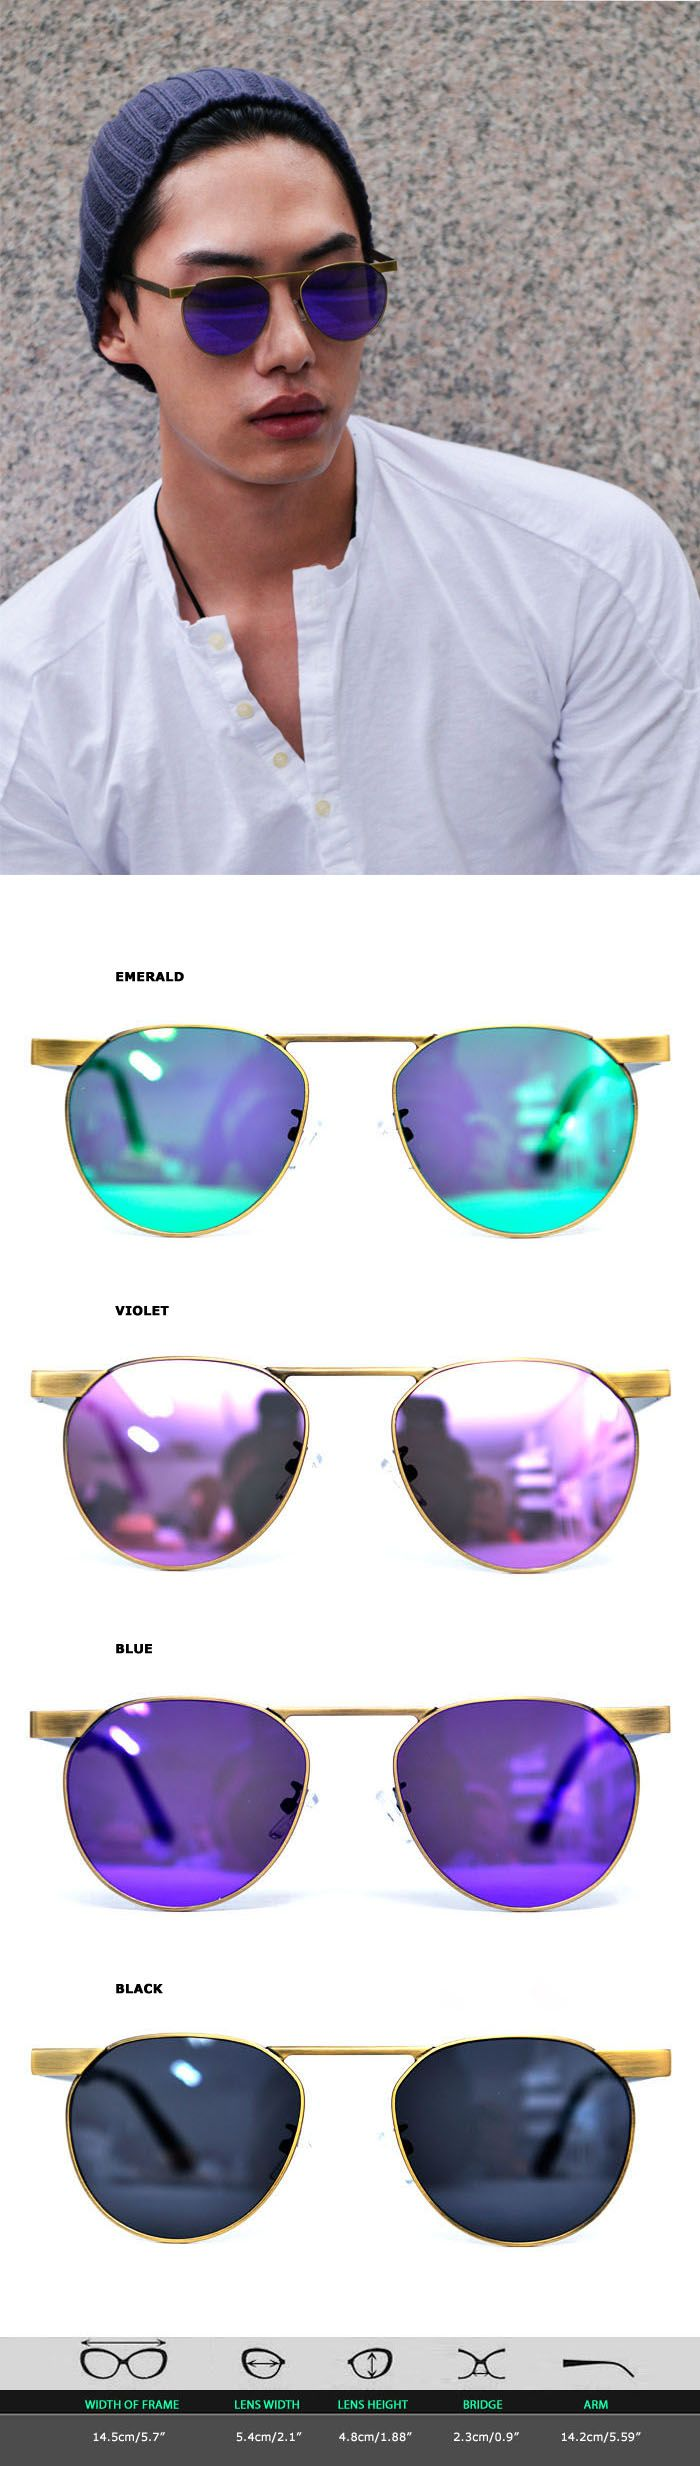 Retro Brass Frame Tint Teardrop-Sunglasses 97  by Guylook.com  #guylook #fashion #sunglass #summer #style #instagram #cool #여름 #선글라스 #패션스타일 #스타일 #패션 #패피 #mirror #mirrorsunglass #미러선글라스